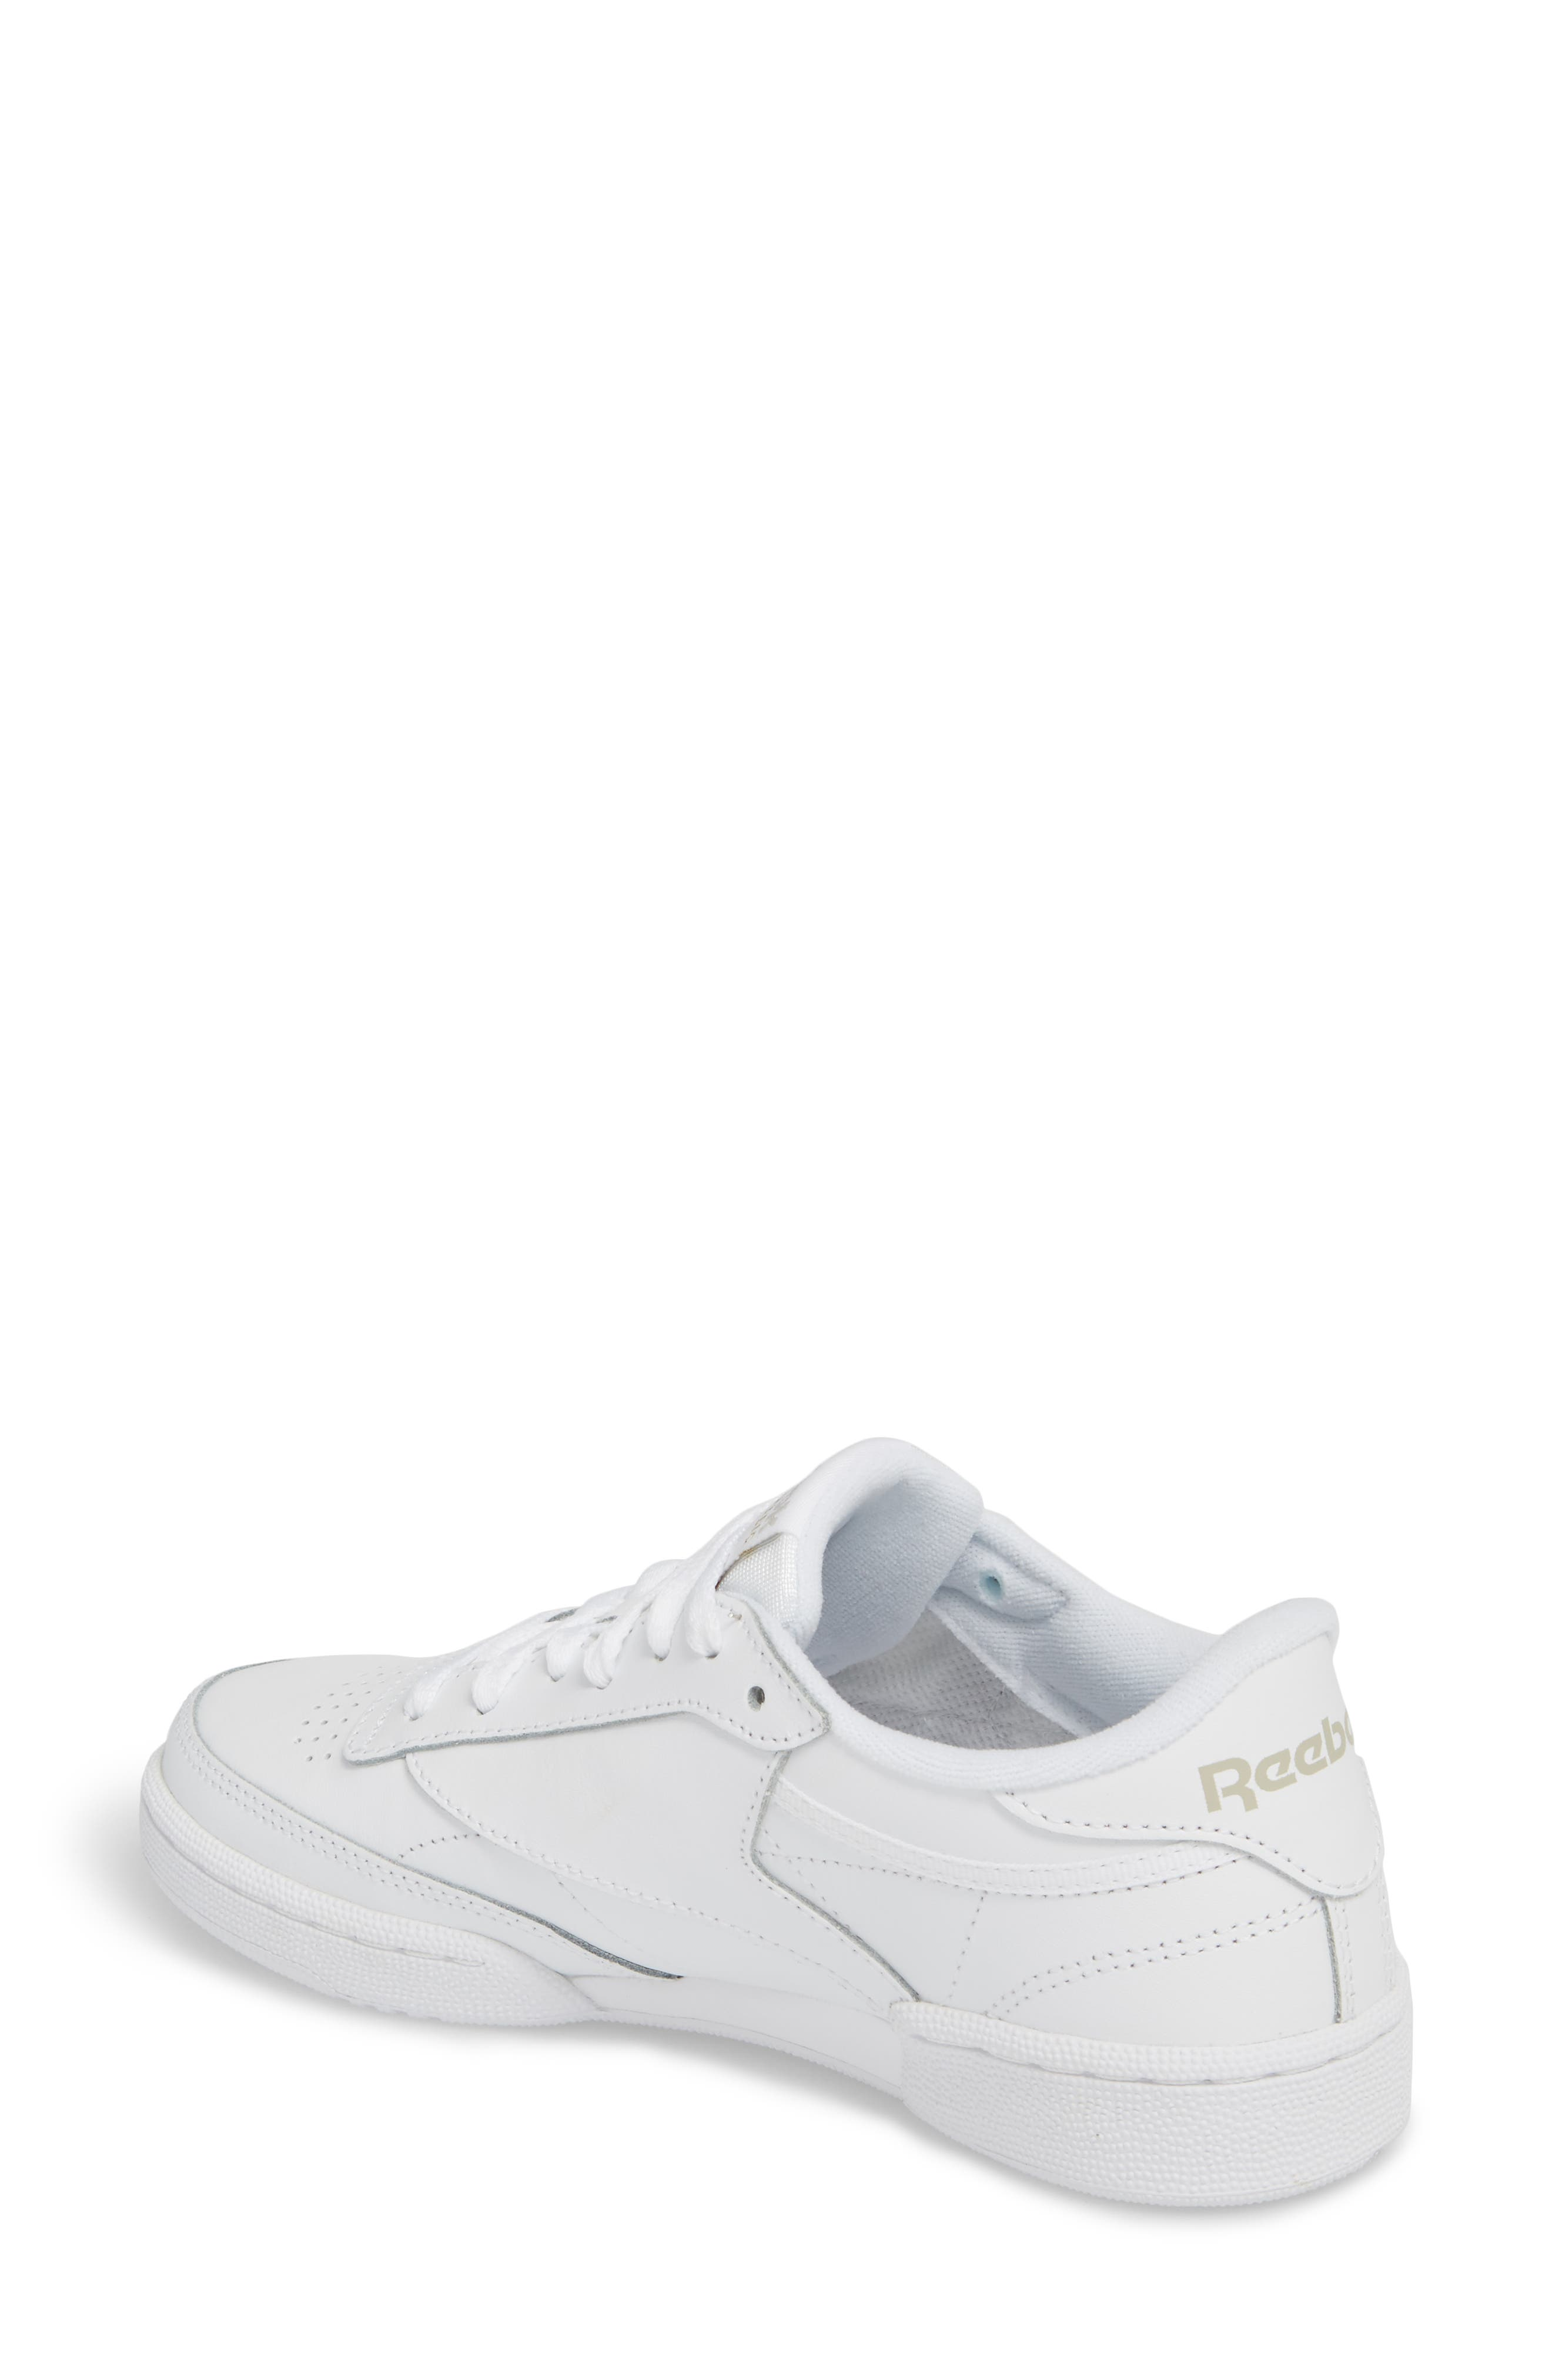 Club C 85 Sneaker,                             Alternate thumbnail 2, color,                             WHITE/ LIGHT GREY